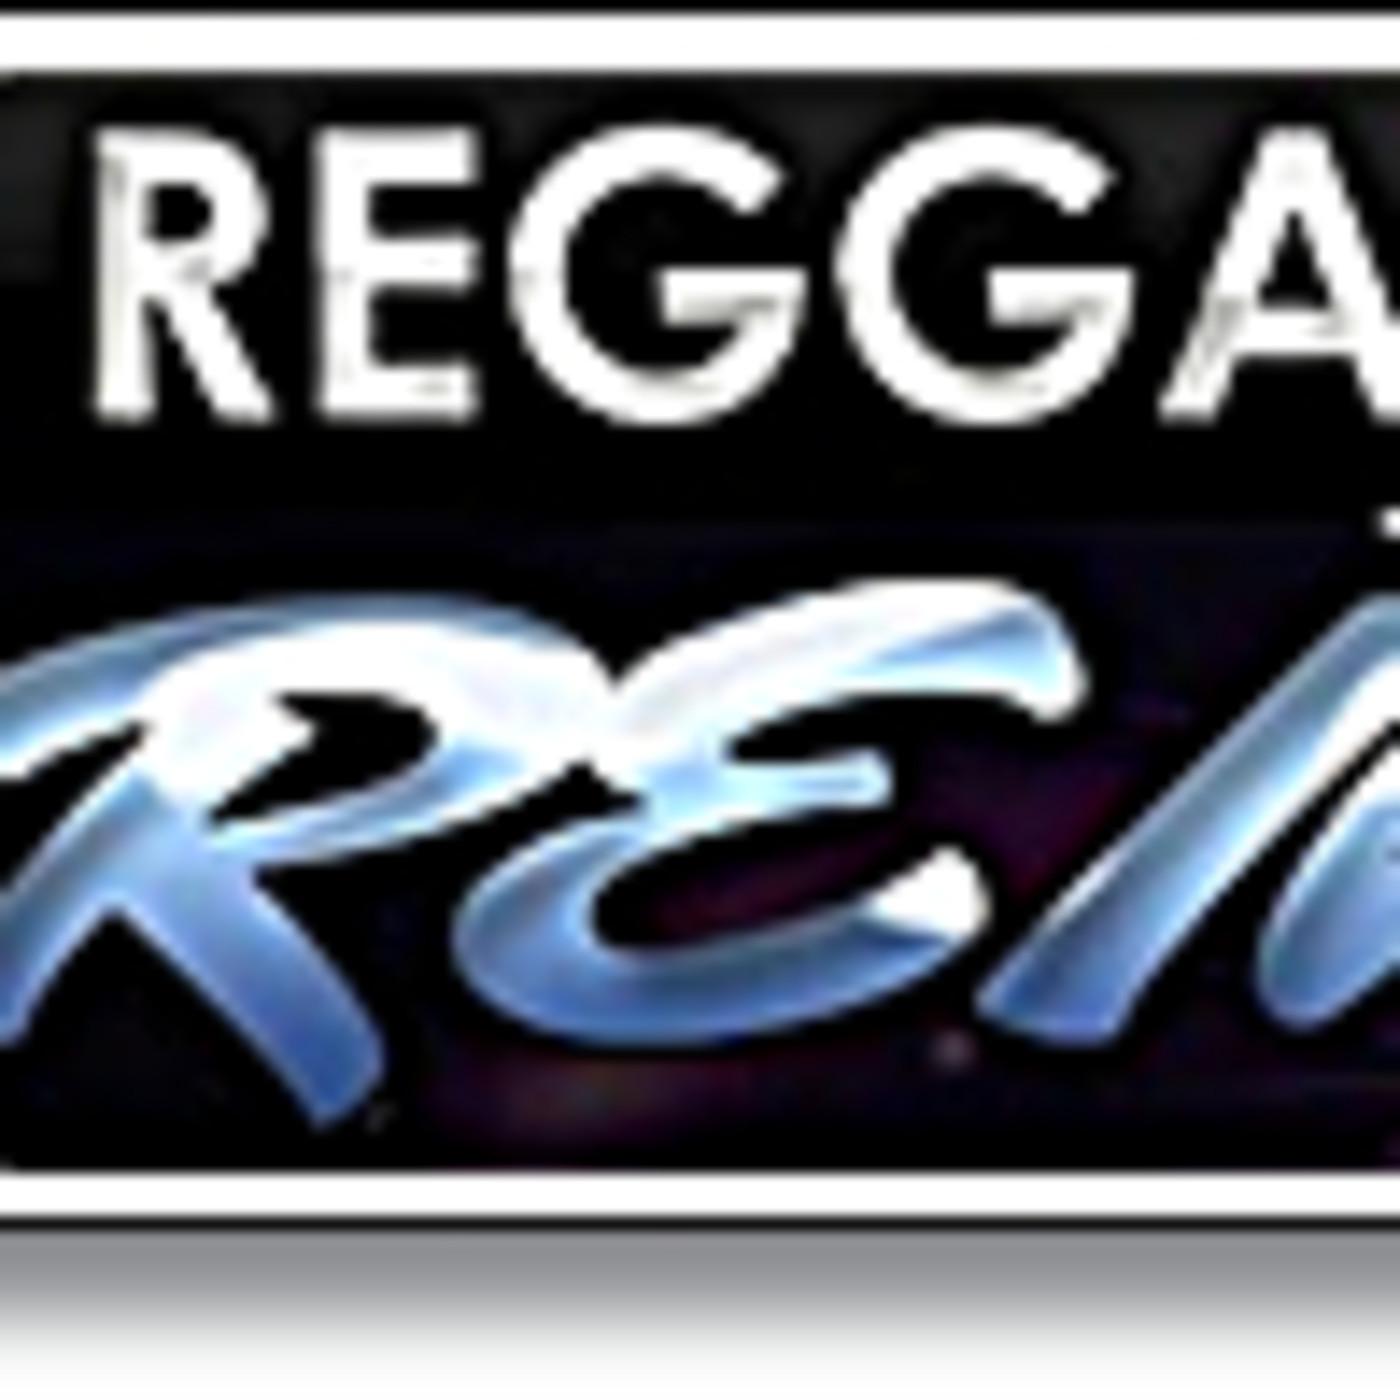 Regeton hits 2017 2 the remixes one mix bismarckdj